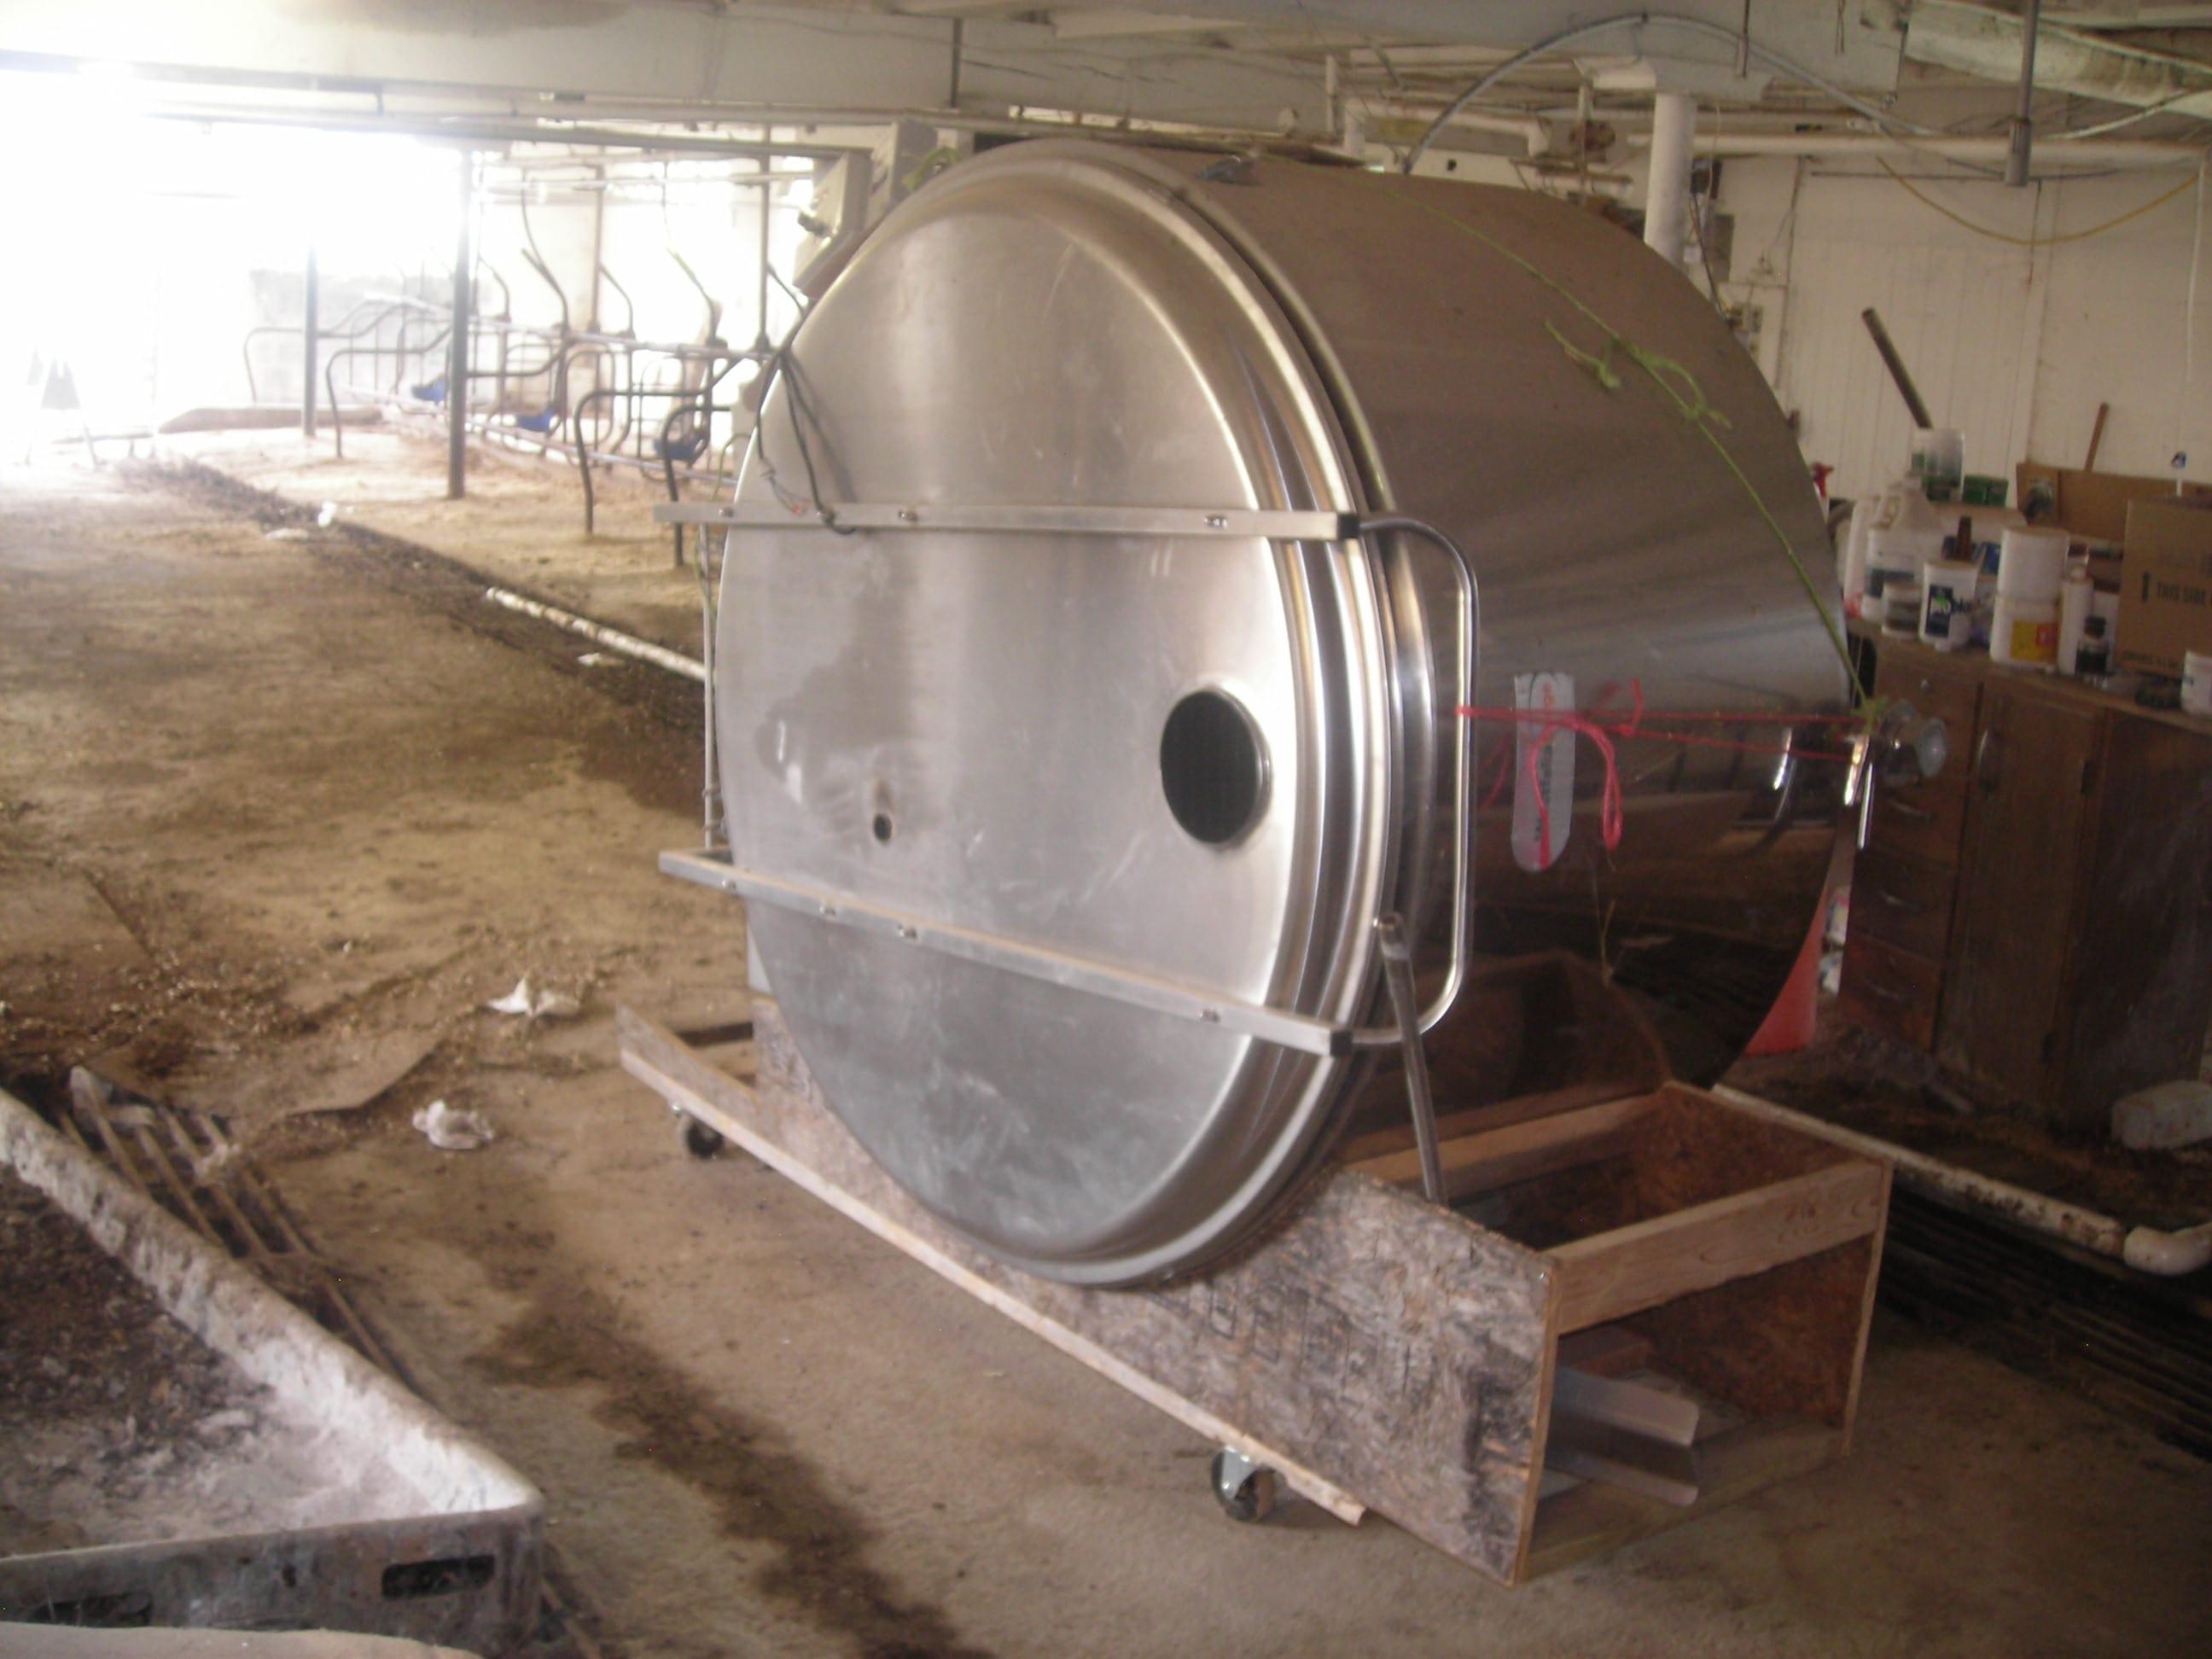 264 Gallon WestfaliaSurge Bulk Tank – $3500